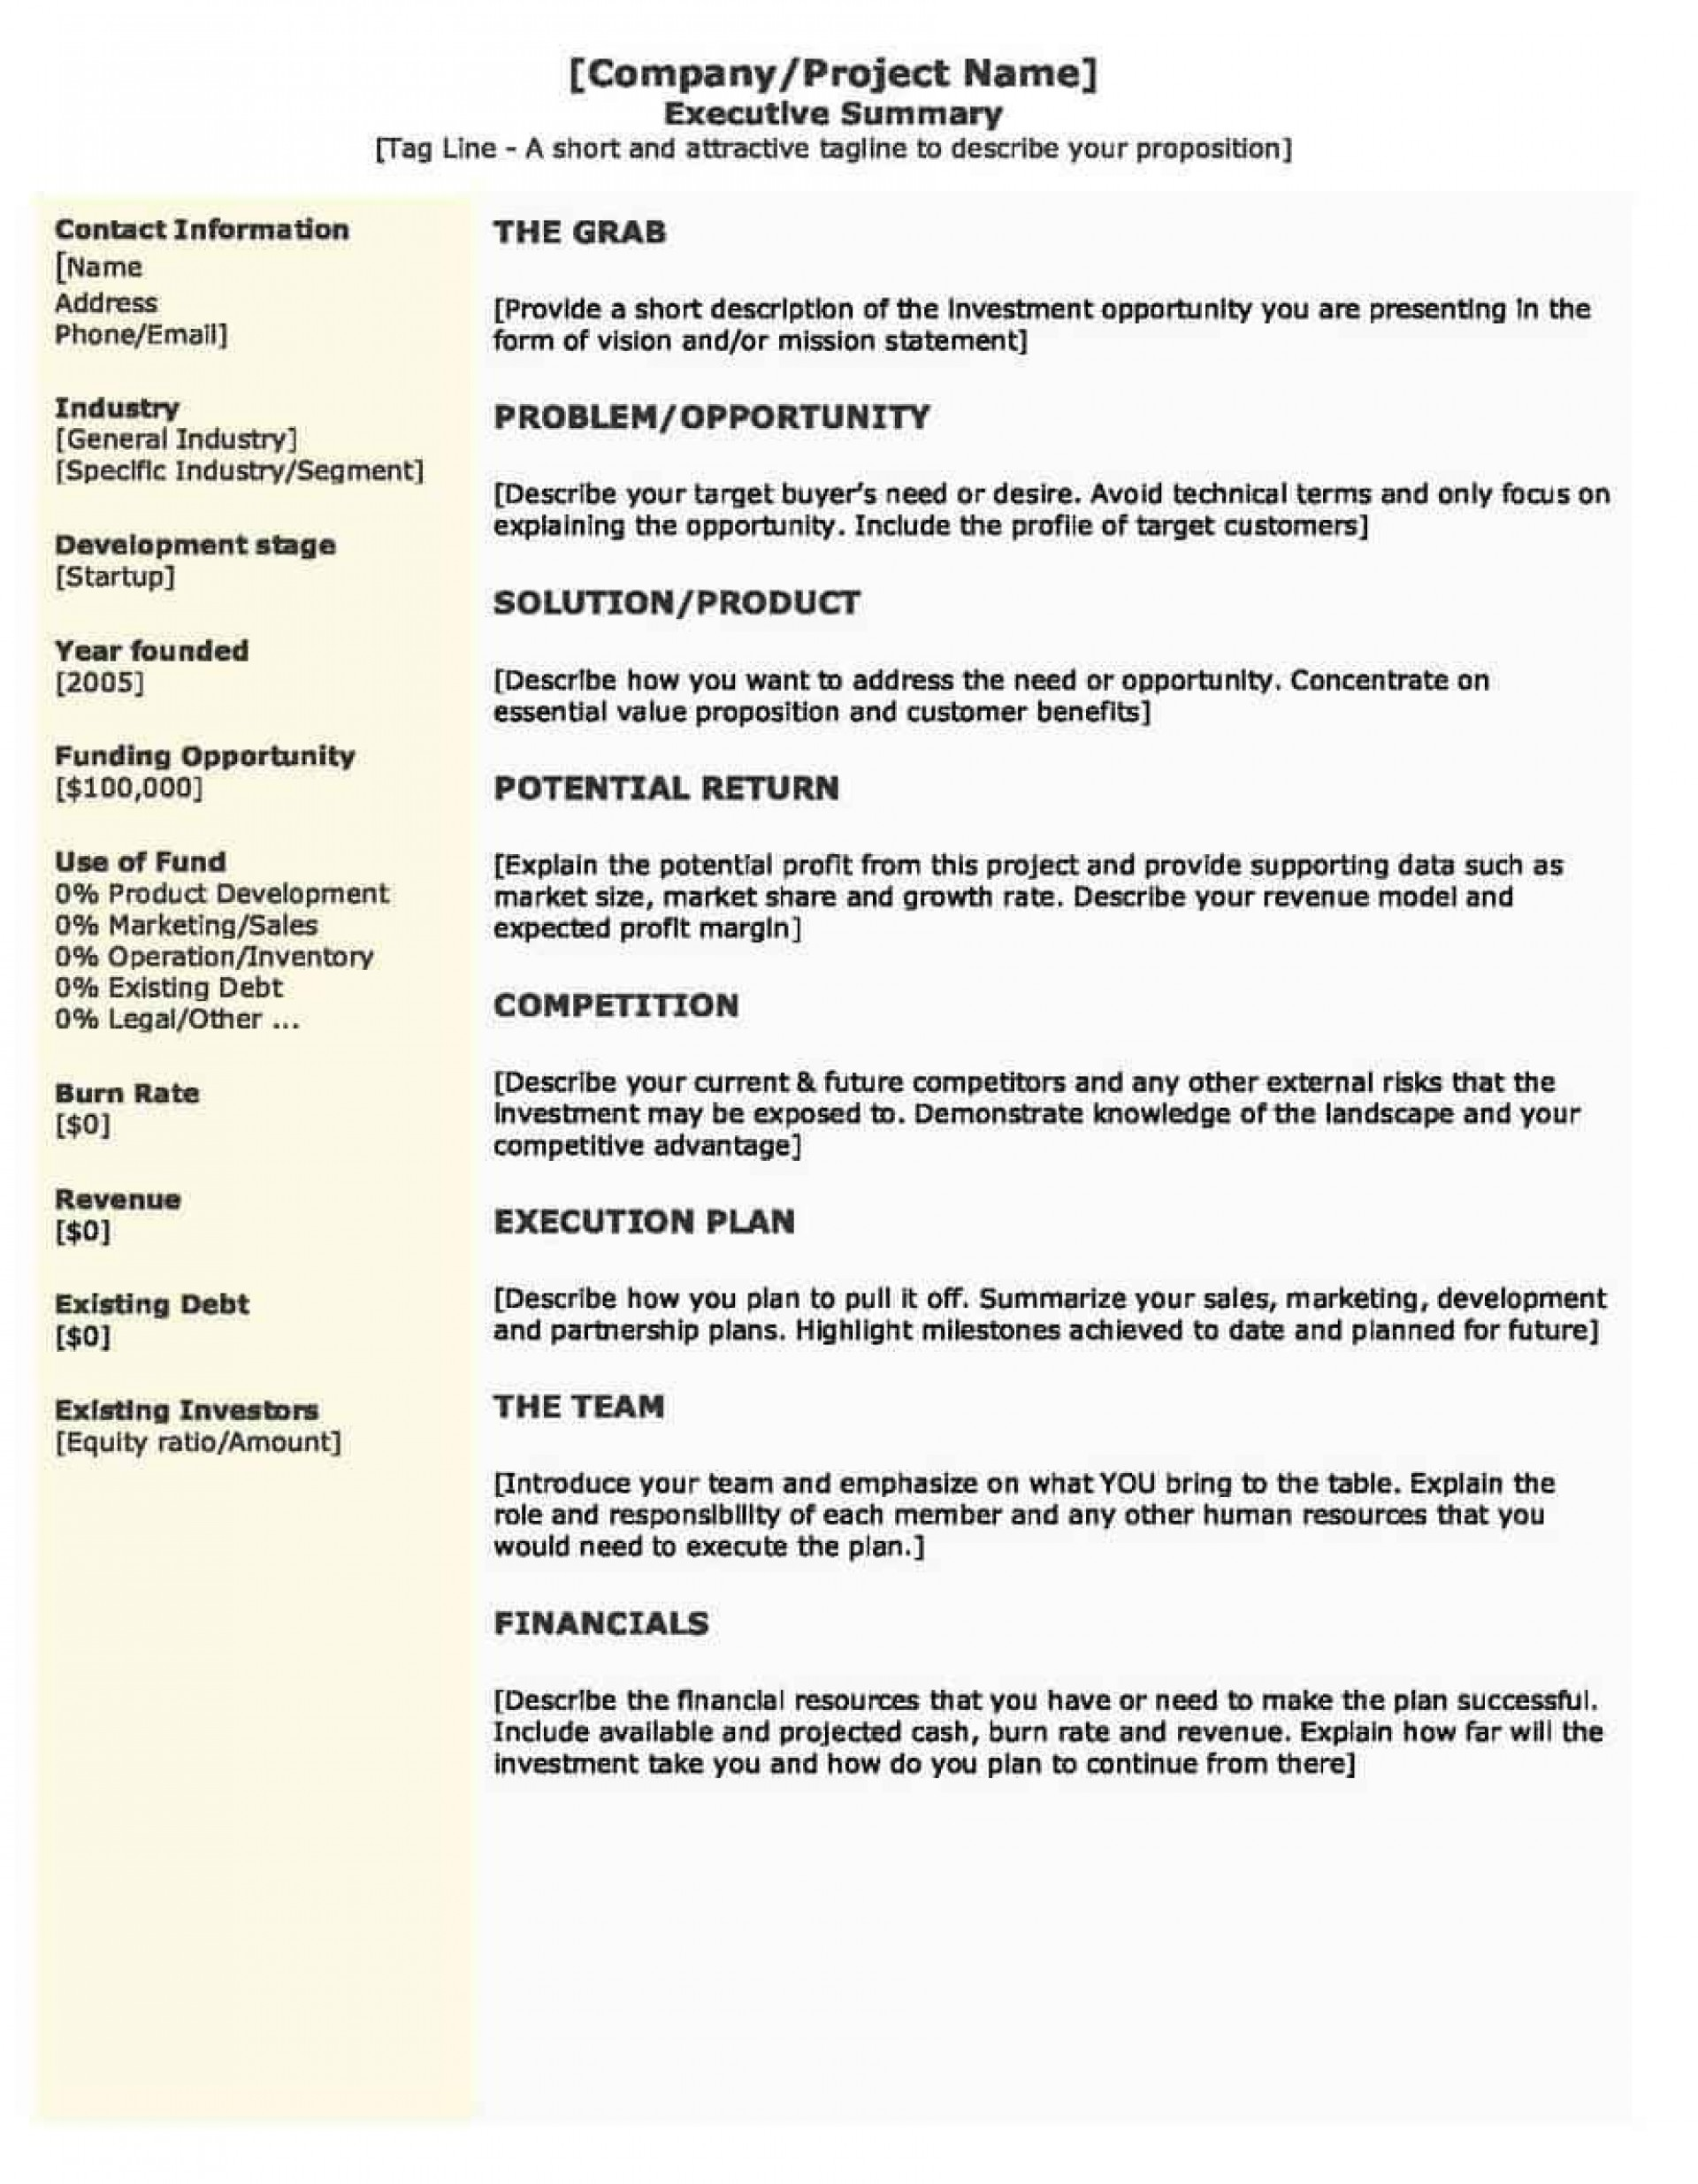 001 Imposing Executive Summary Template Word Free Photo 1920